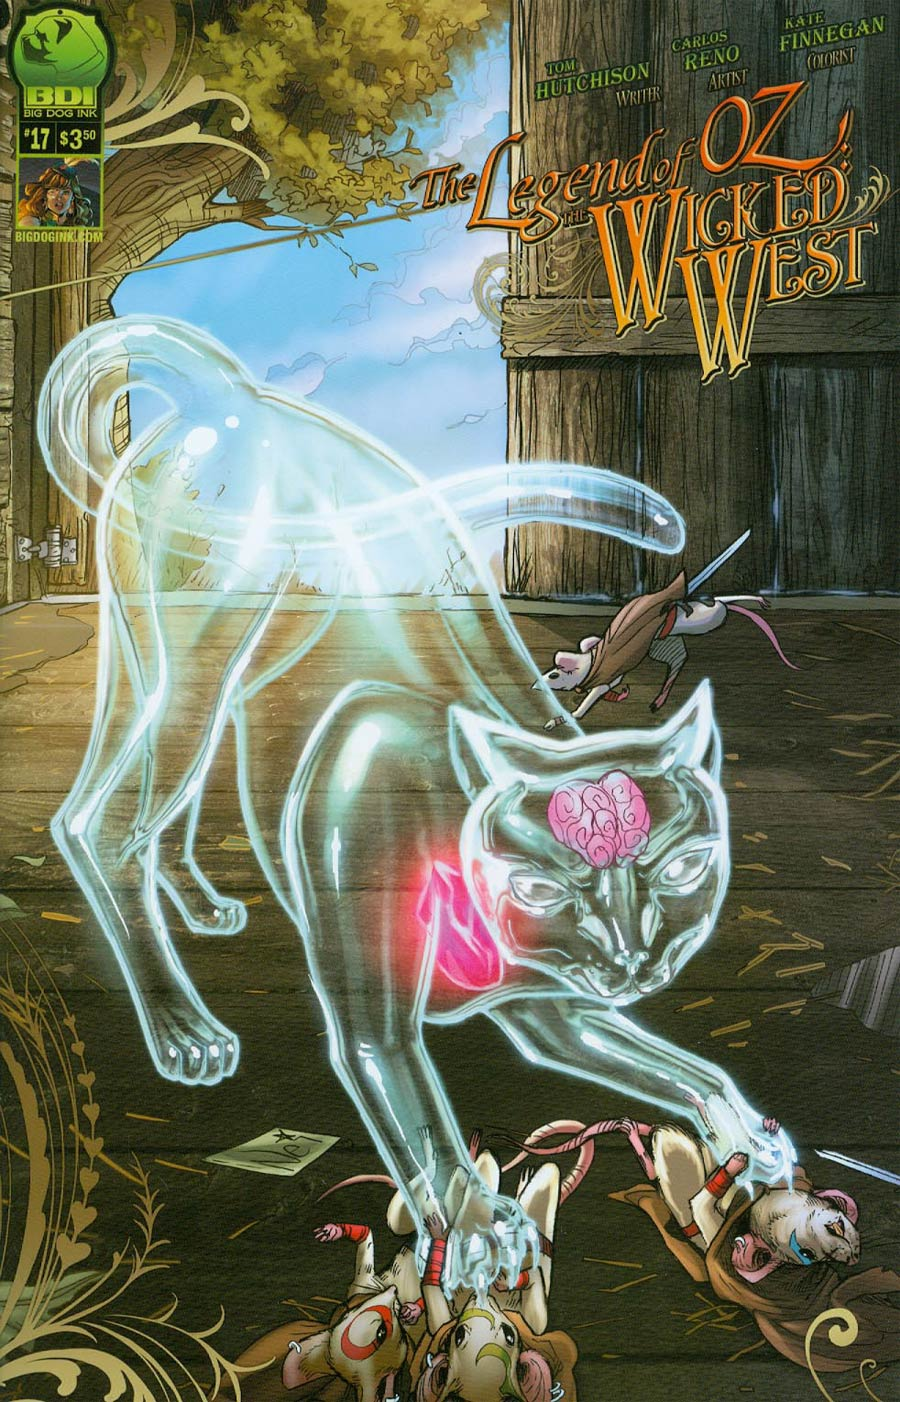 Legend Of Oz The Wicked West Vol 2 #17 Cover B Nei Ruffino